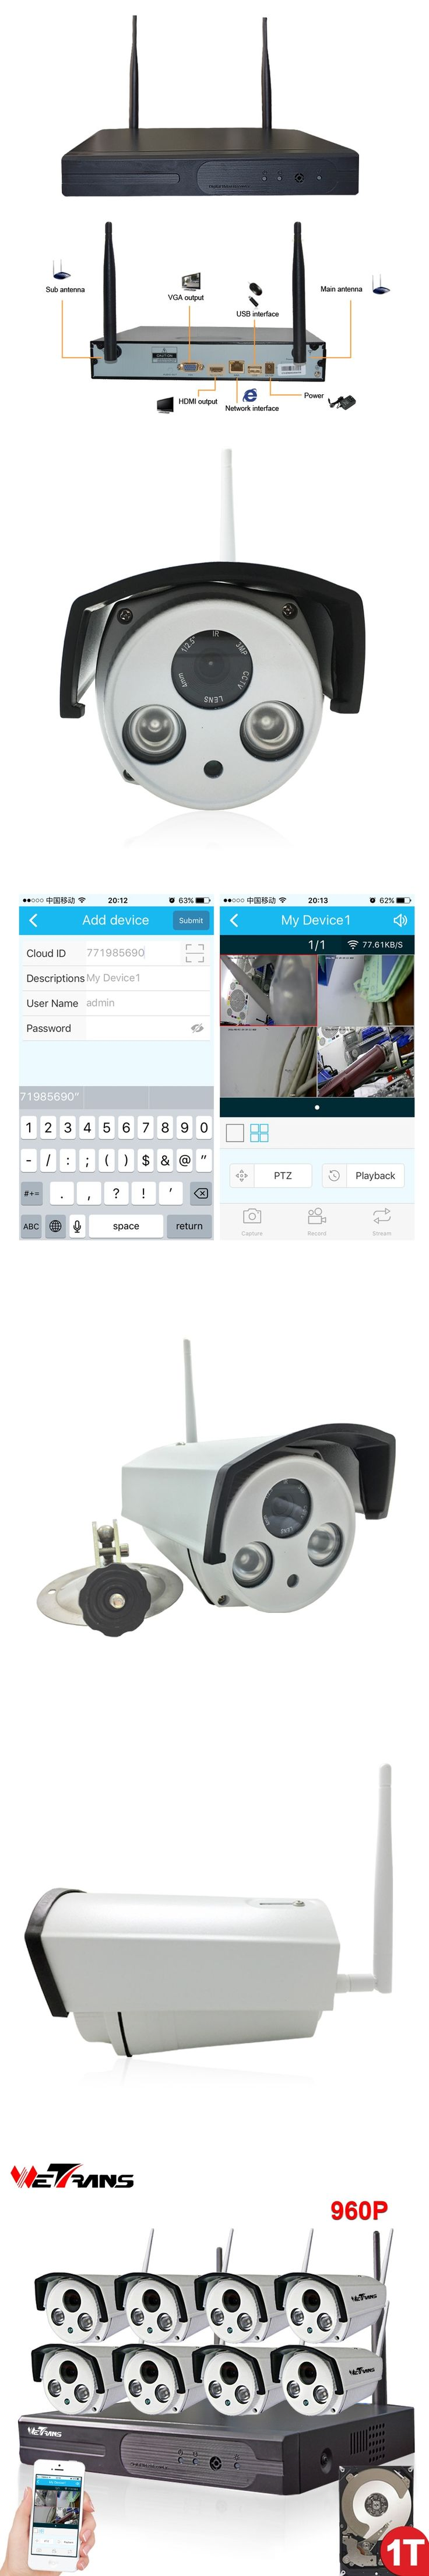 CCTV 8CH Wifi NVR Kit 20m Night Vision Waterproof P2P 960P HD 1.3MP Wireless CCTV Camera Kit Home Video Security Camara System